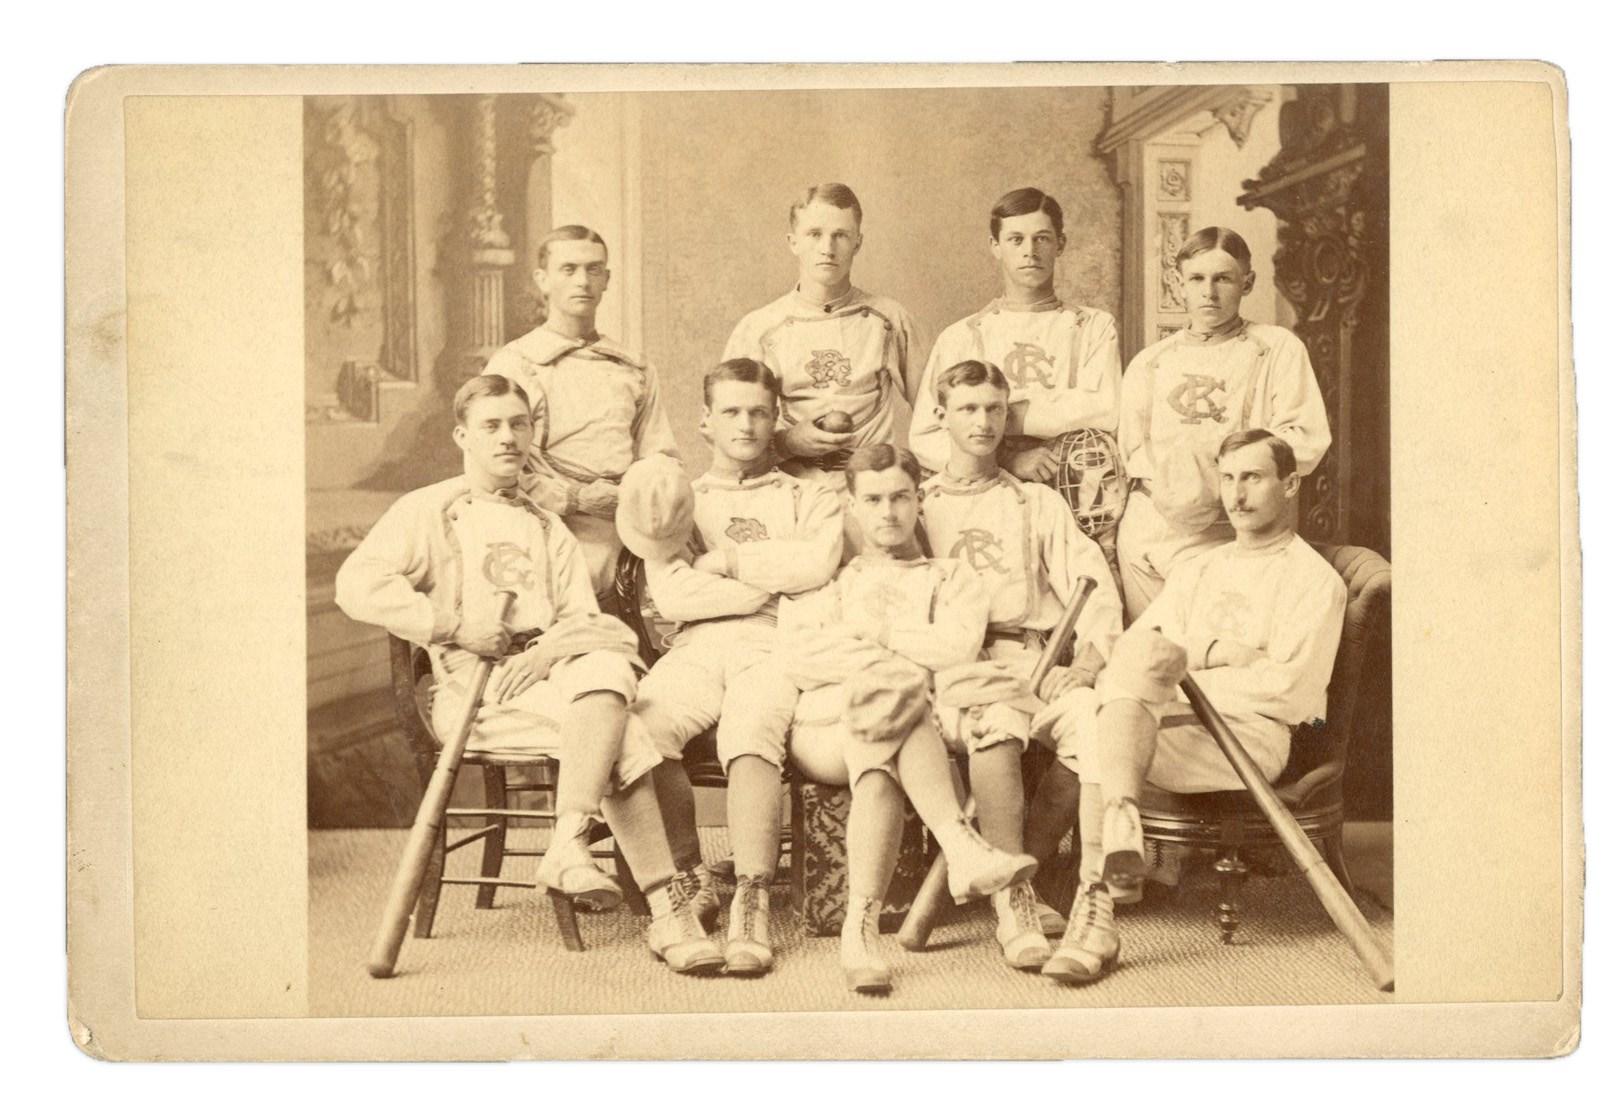 Early Baseball - Leland's Classic